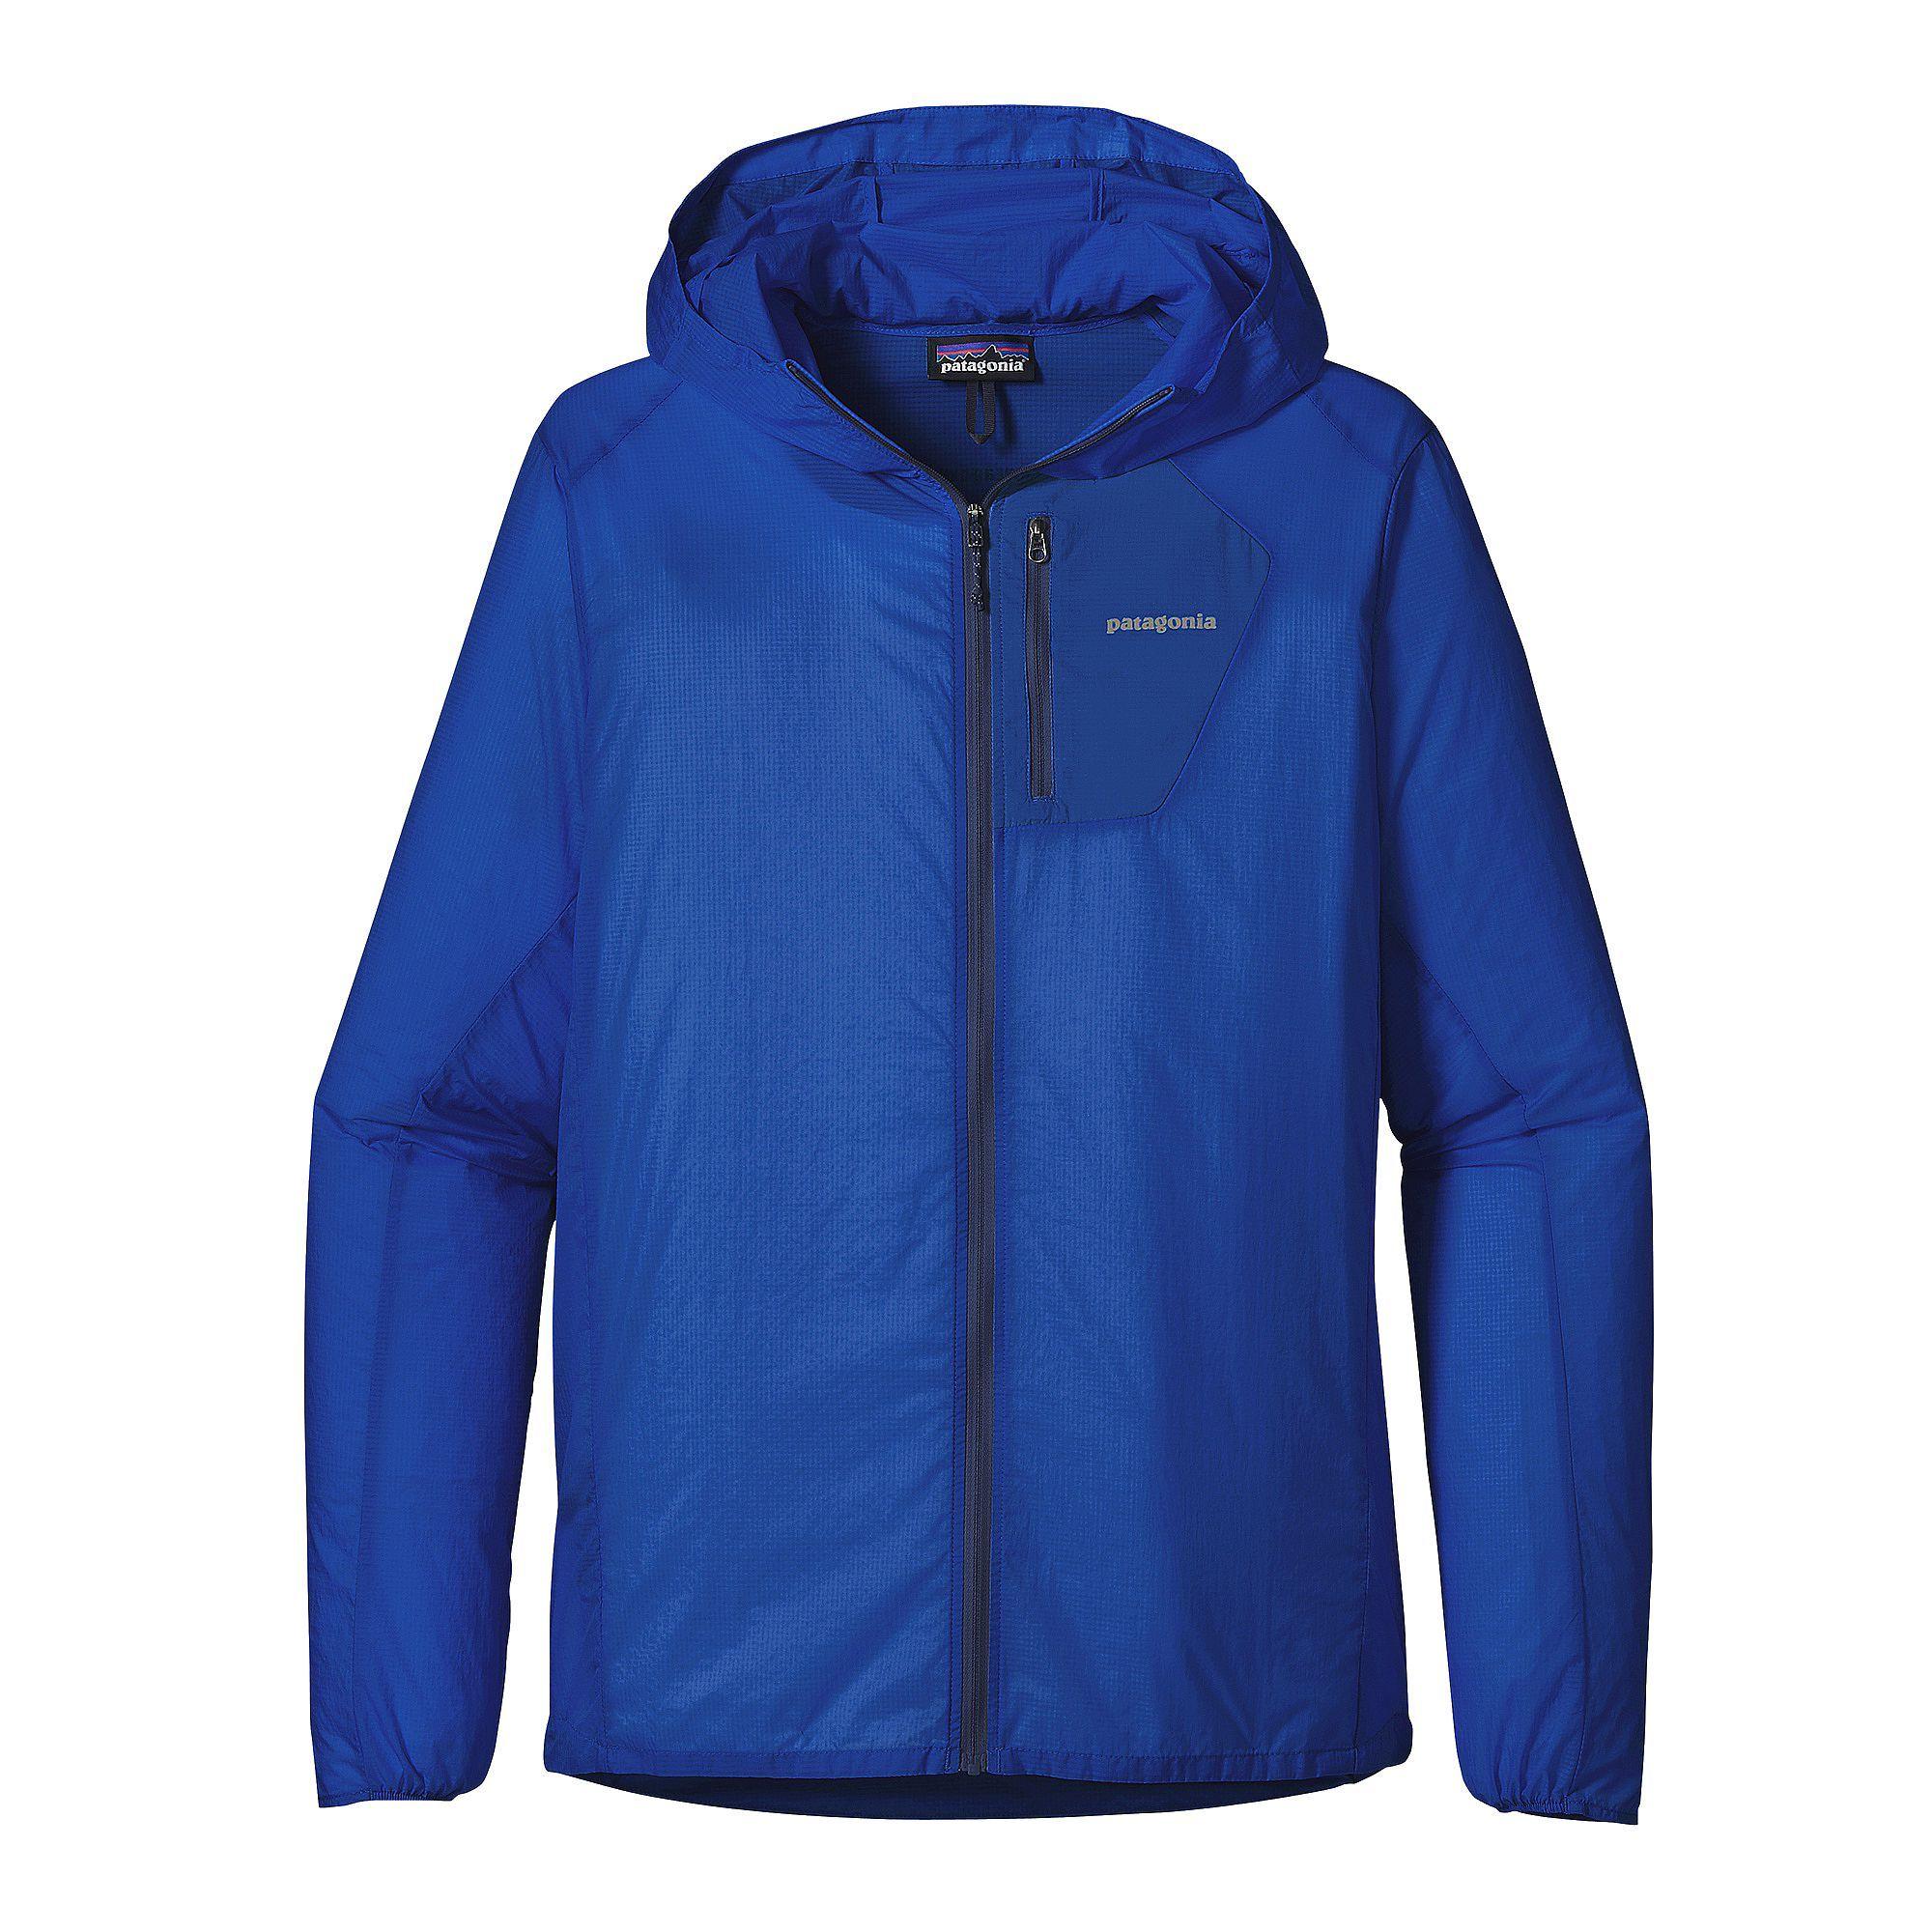 Men's Houdini® Jacket Jackets, Windbreaker jacket